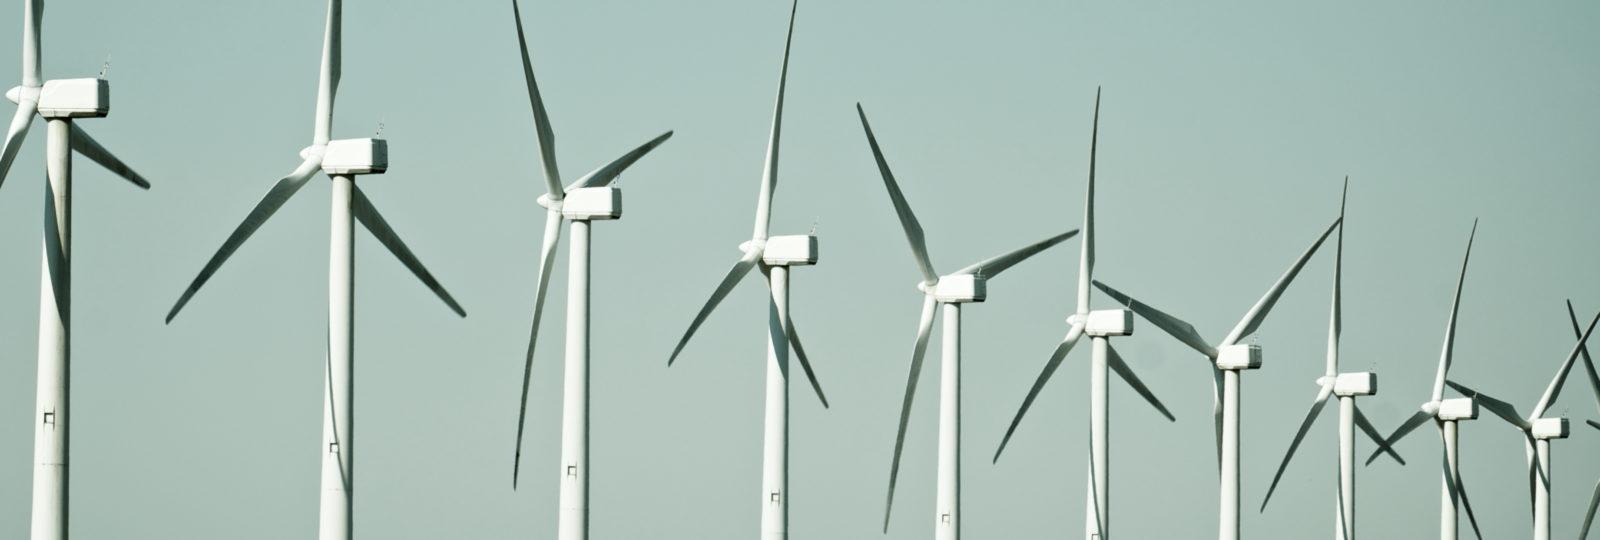 group of windmills for renewable electric energy production, Cintruenigo, Navarre, Spain